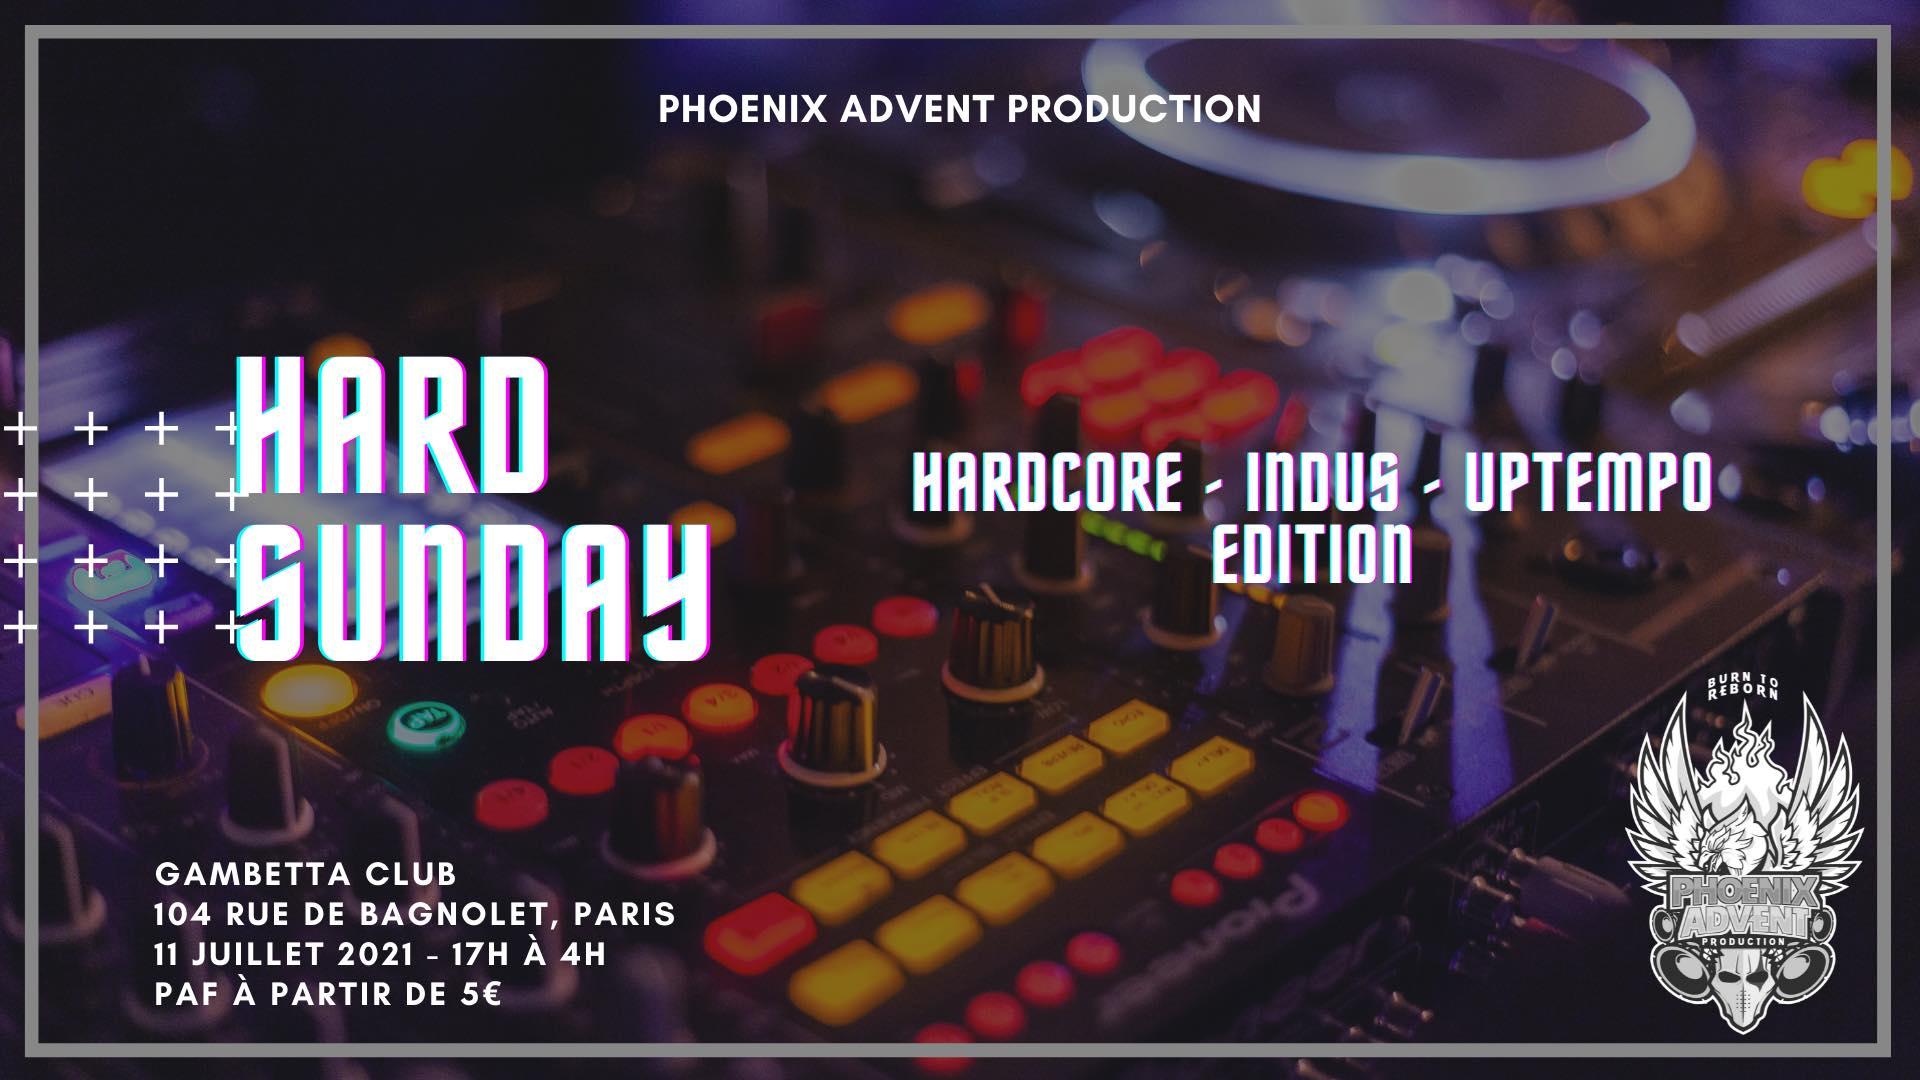 Hard Sunday: Hardcore / Indus / Uptempo Edition